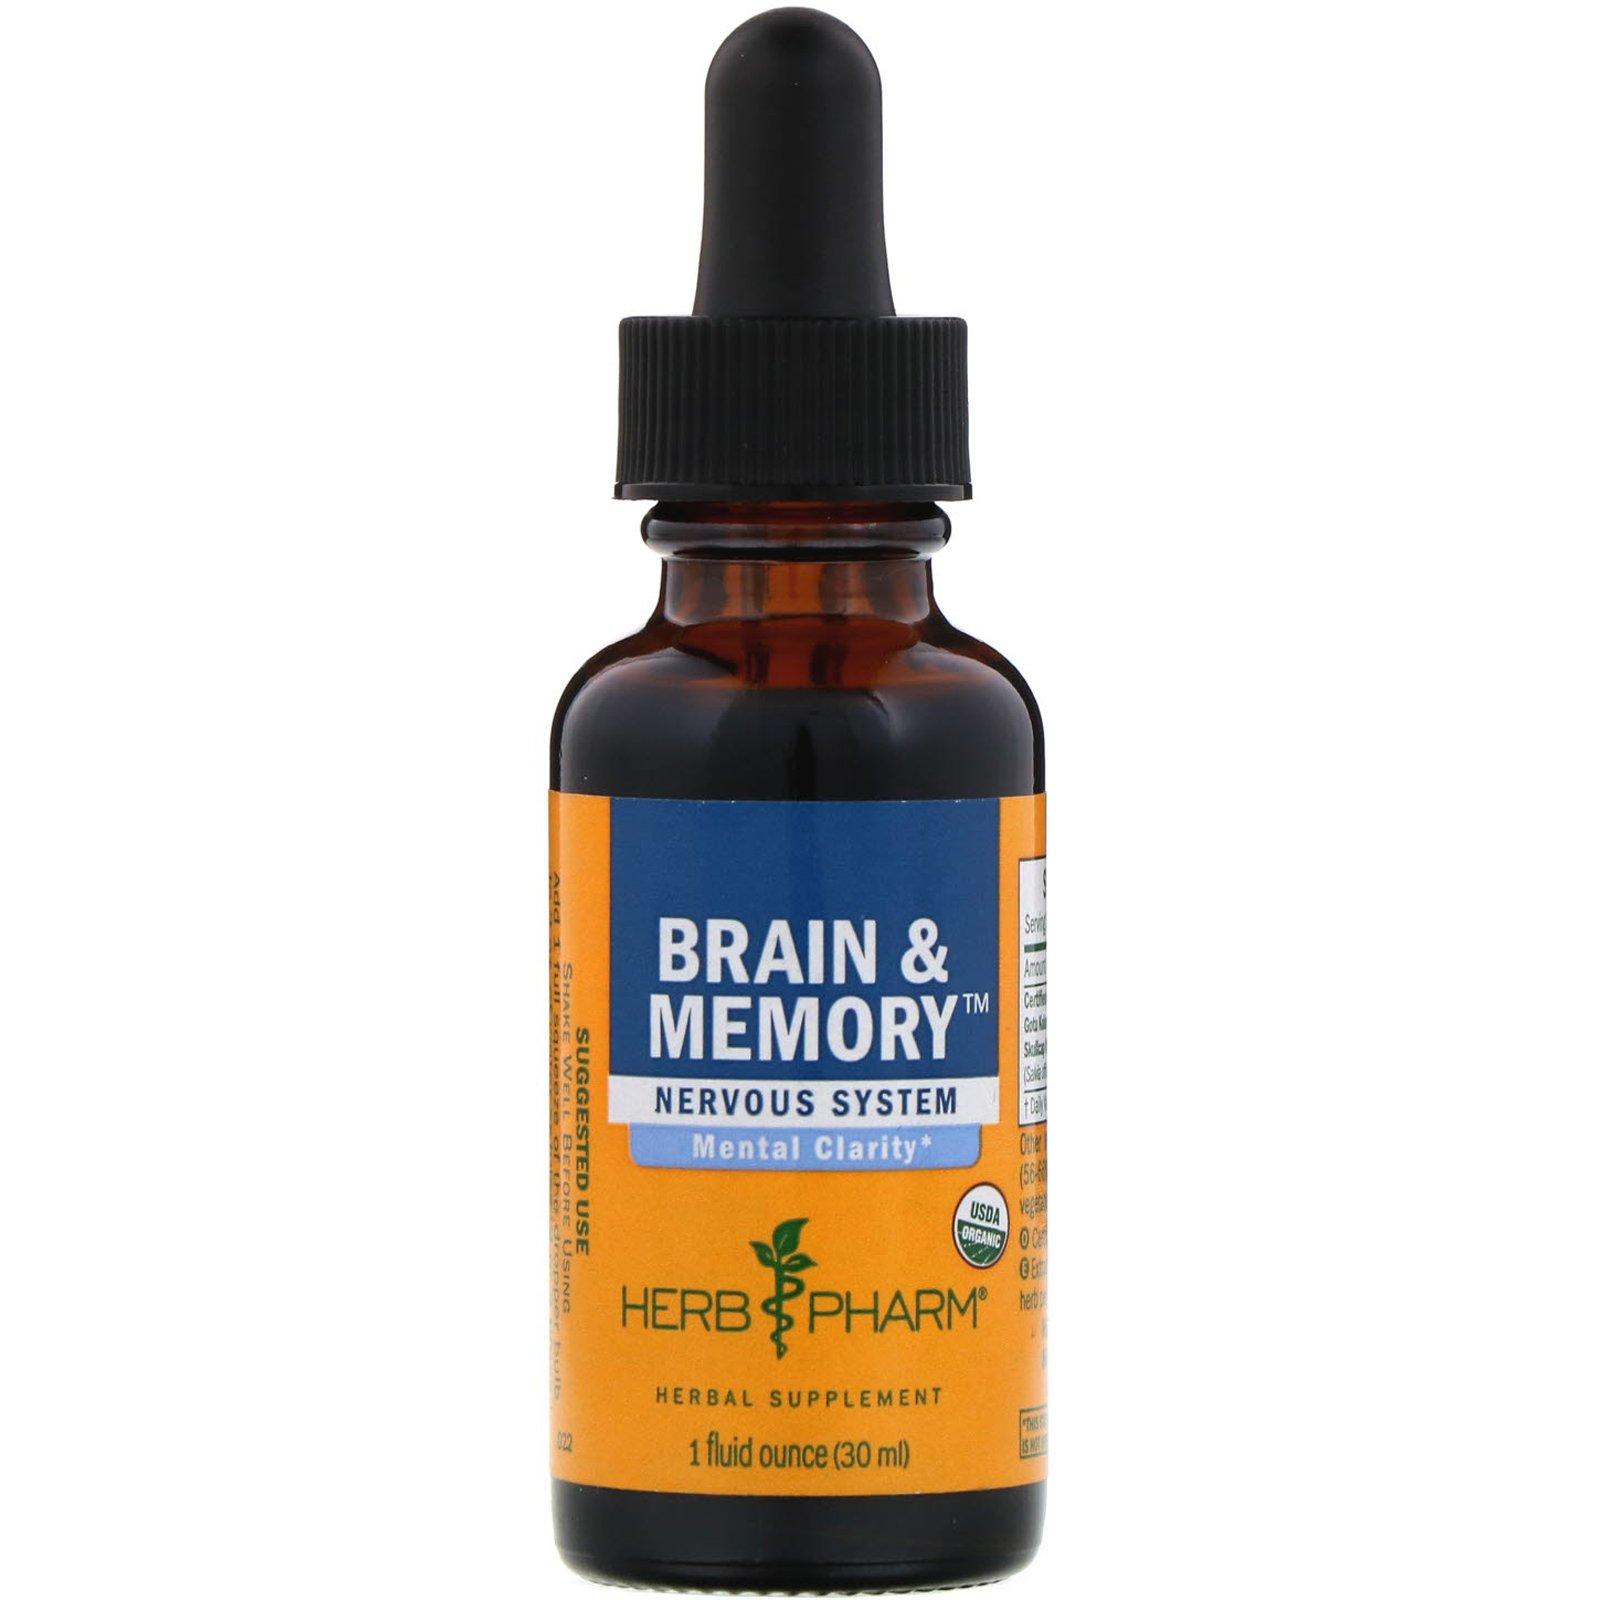 Herb Pharm, Brain & Memory (мозг и память), нервная система, 1 жидкая унция (30 мл)